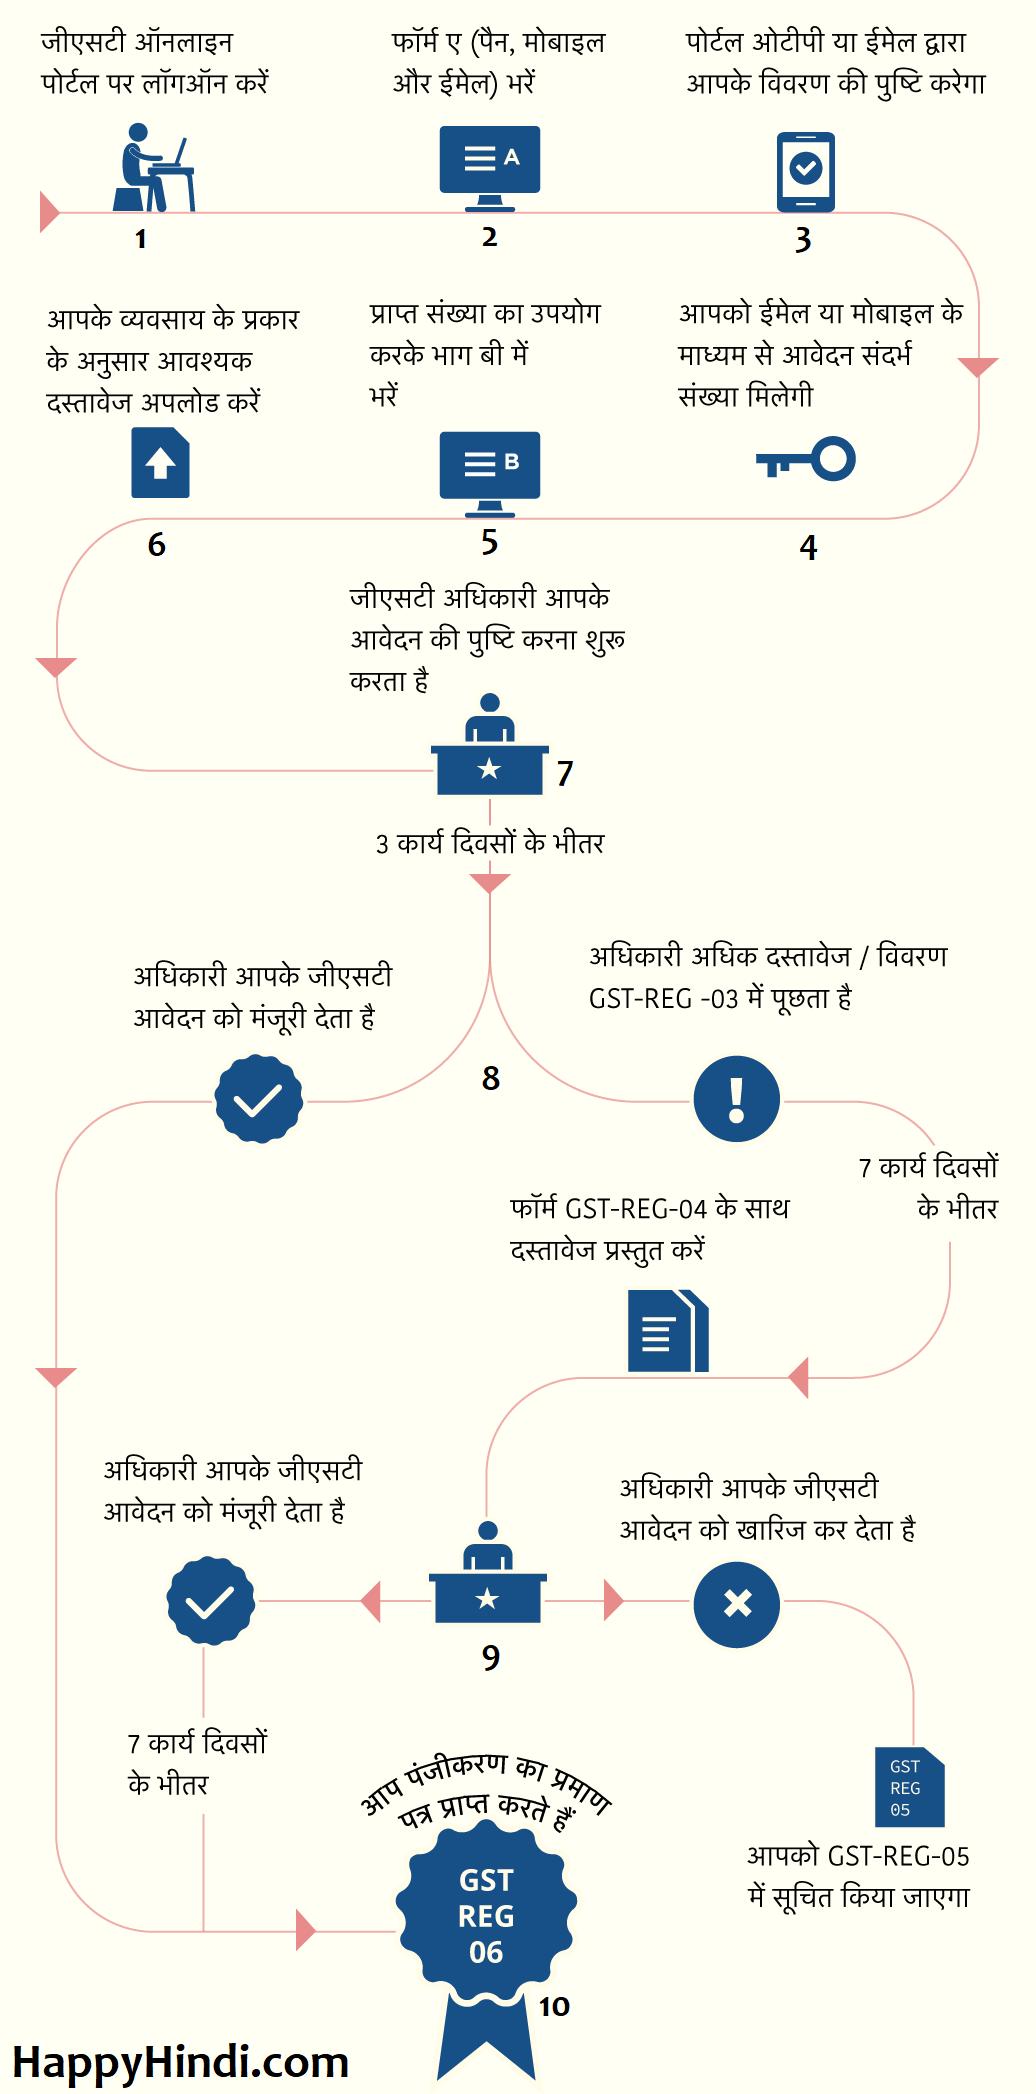 GST Registration - Happyhindi.com